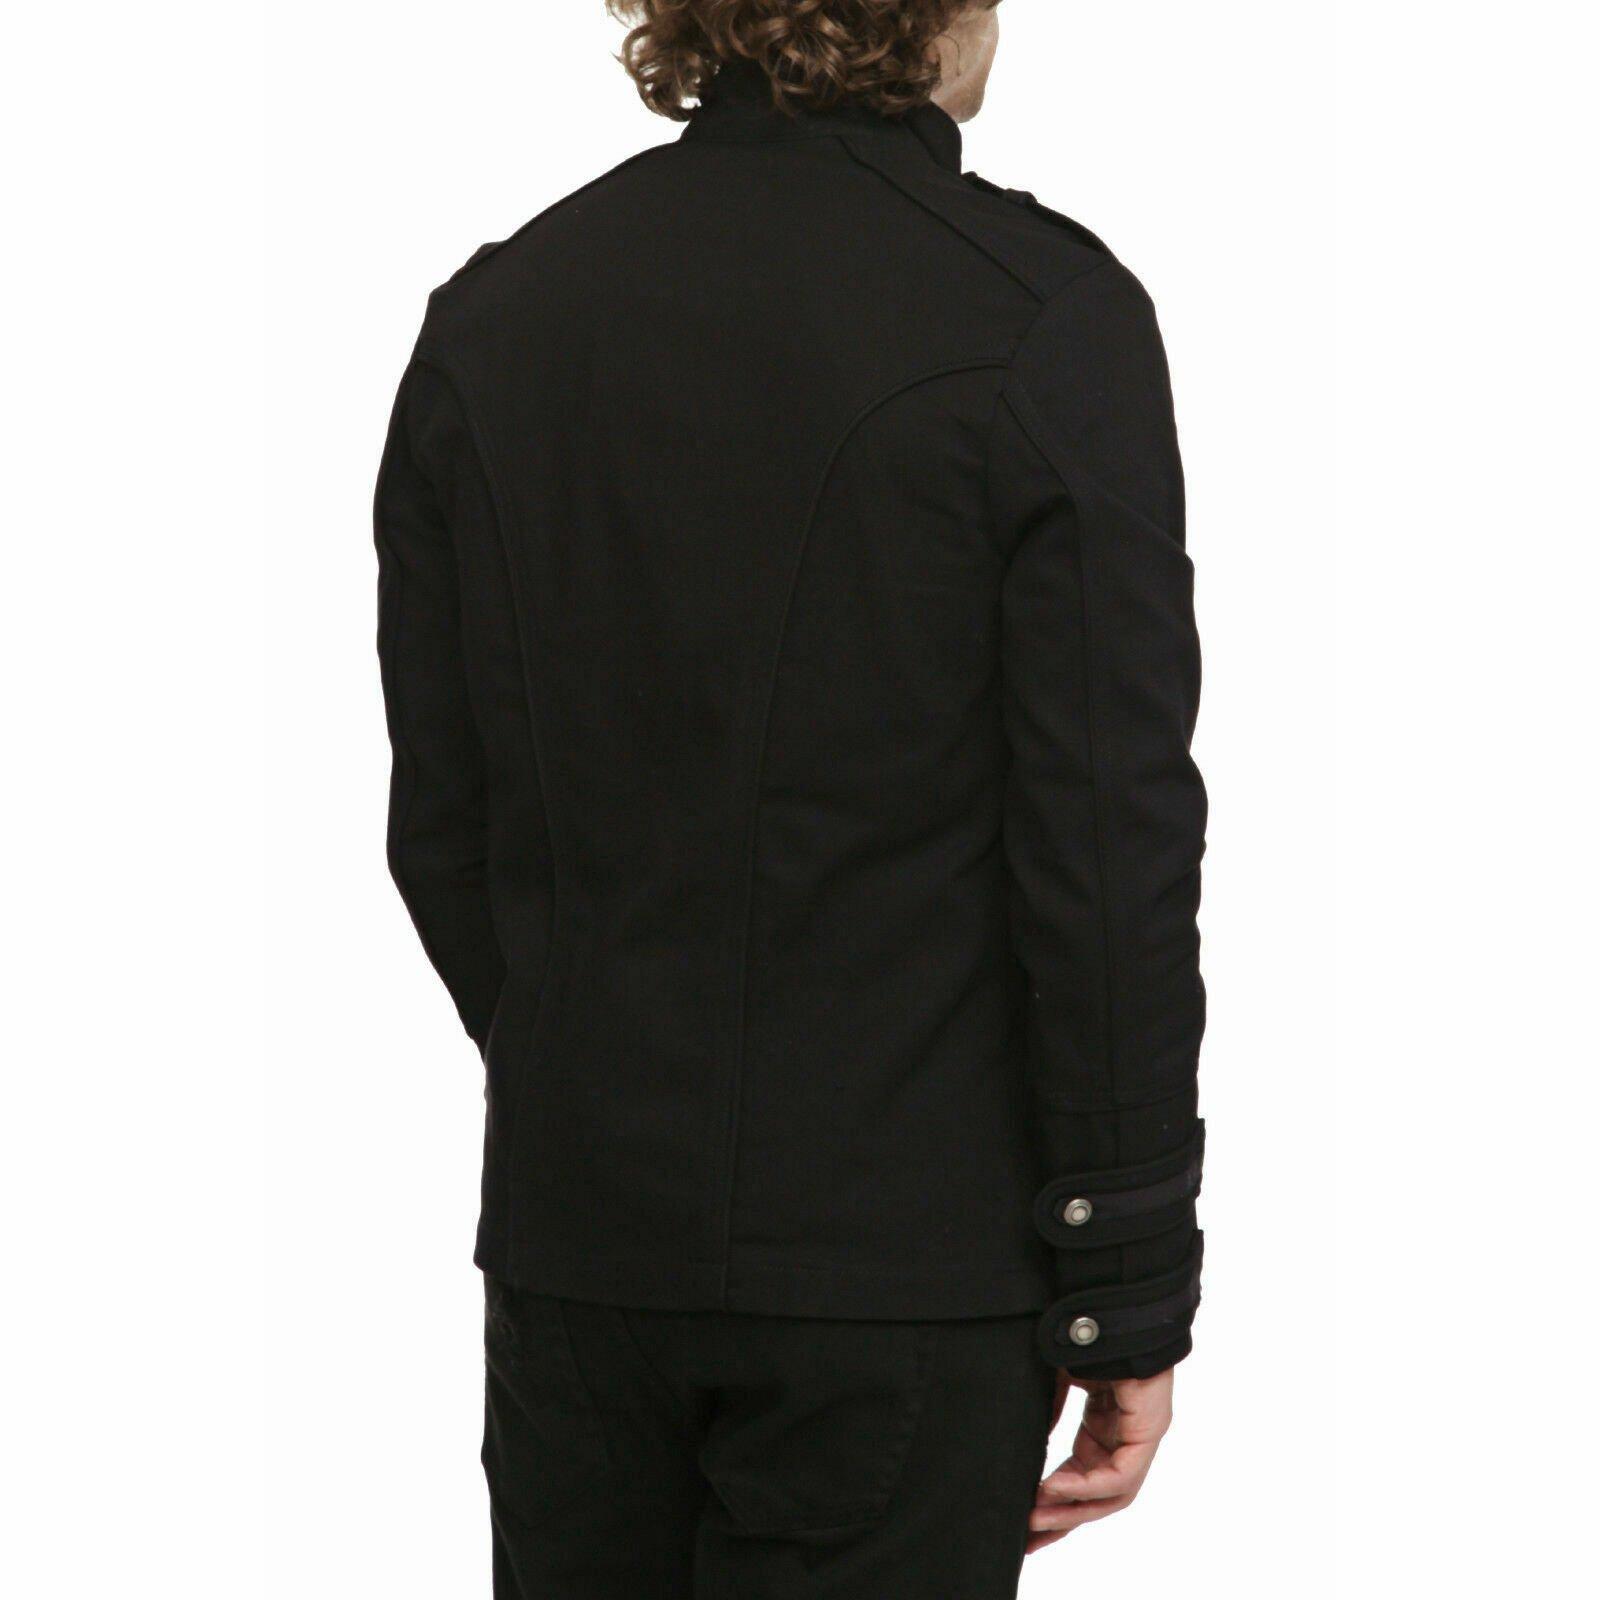 Gothic Military Band Black Jacket for Men Vintage Goth Coat Jacket STEAMPUNK (3)